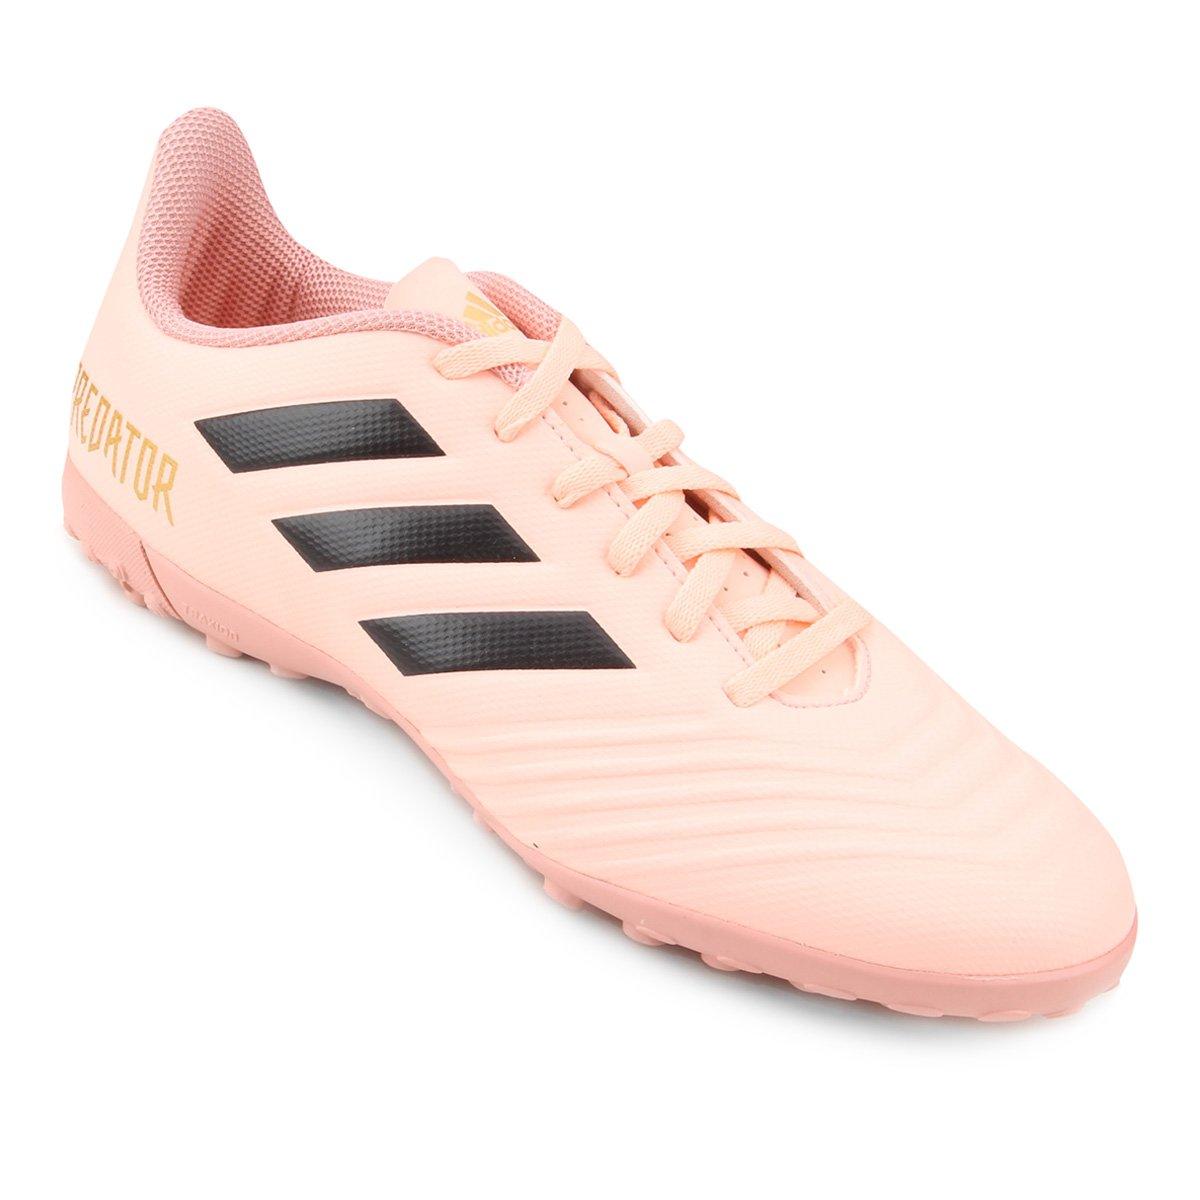 Chuteira Society Adidas Predator Tan 18 4 TF - Rosa e Preto - Compre ... 7b18c8a8737be